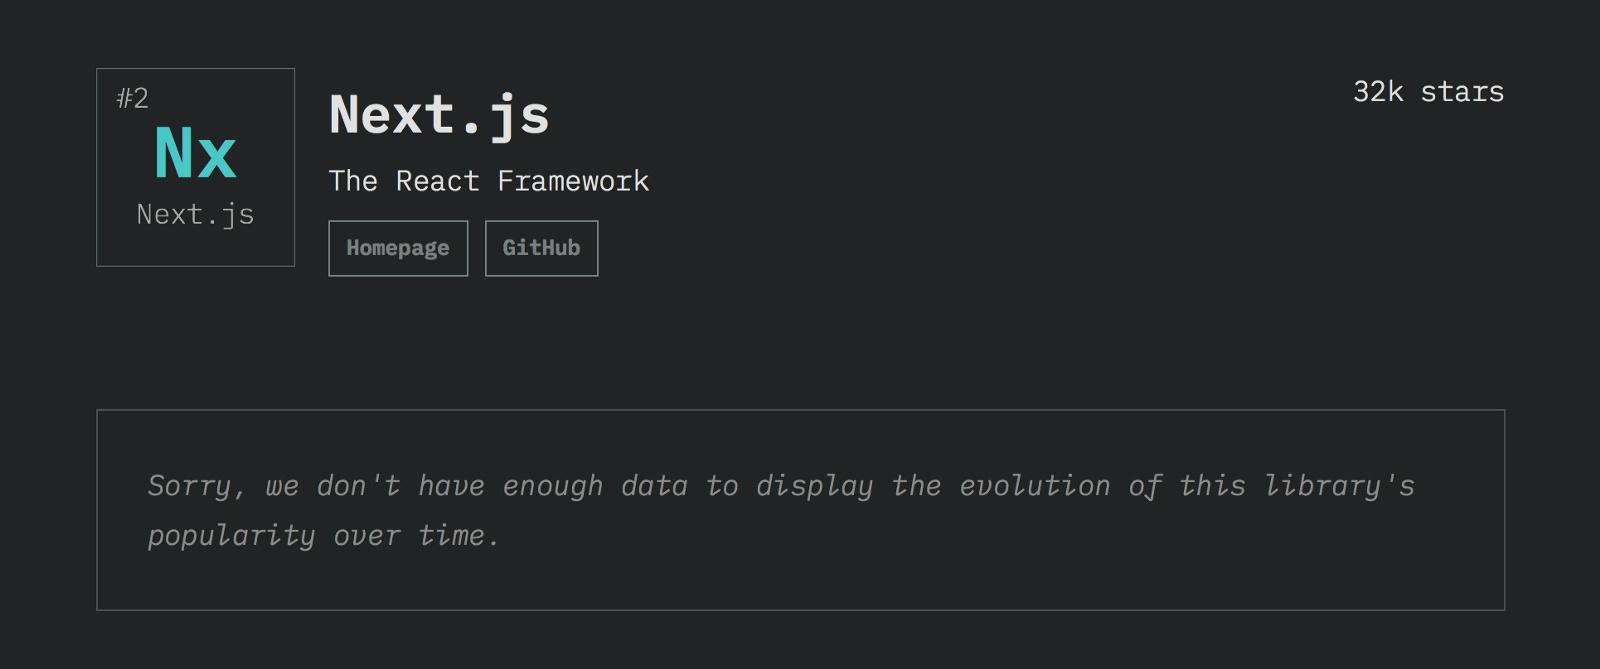 Javascript-фреймворки: тенденции 2019 года - 10